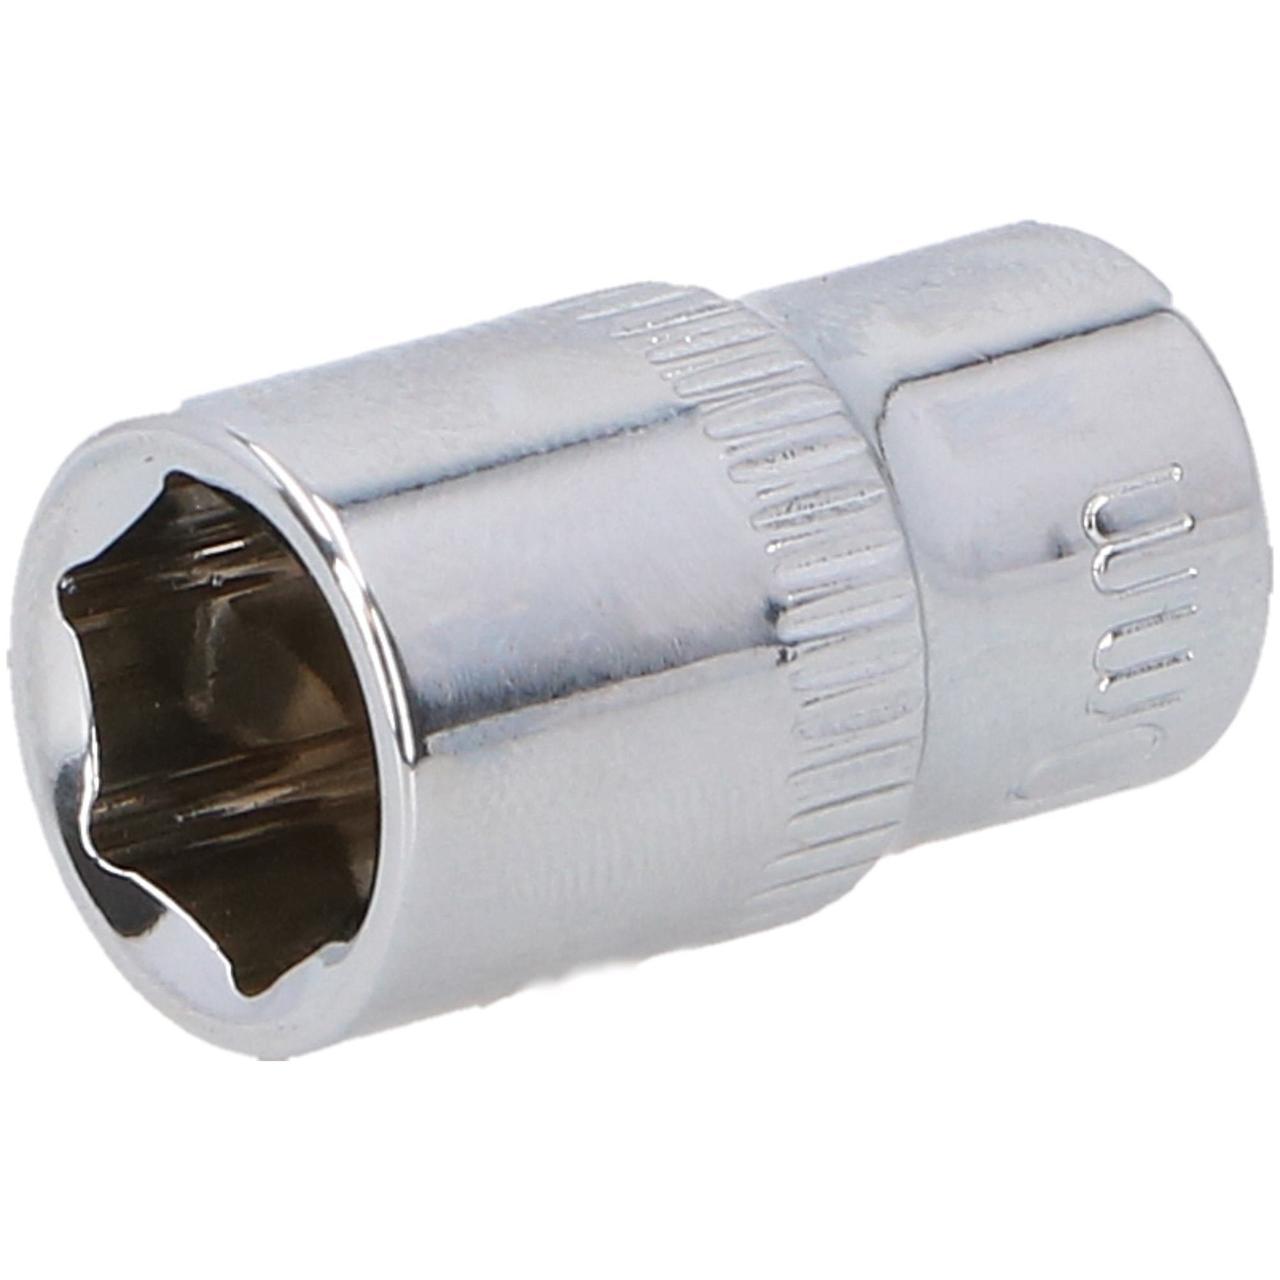 "Головка торцеві 1/4"" 13 мм FASTER TOOLS"